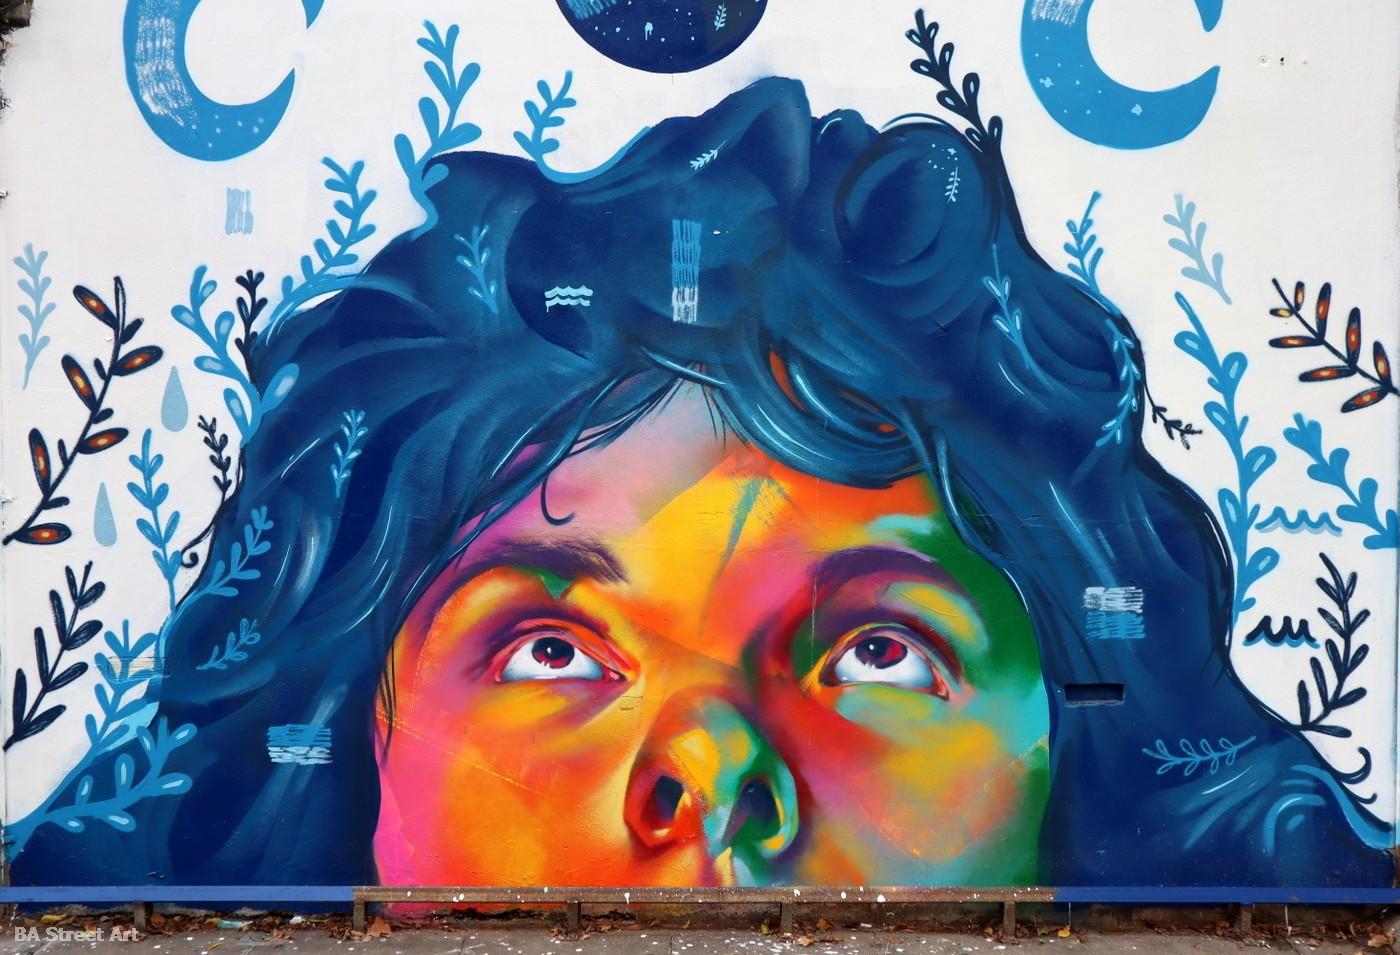 thomas evans detour303 detroit artista buenos aires murales arte urbano street art tour graffiti argentina villa crespo